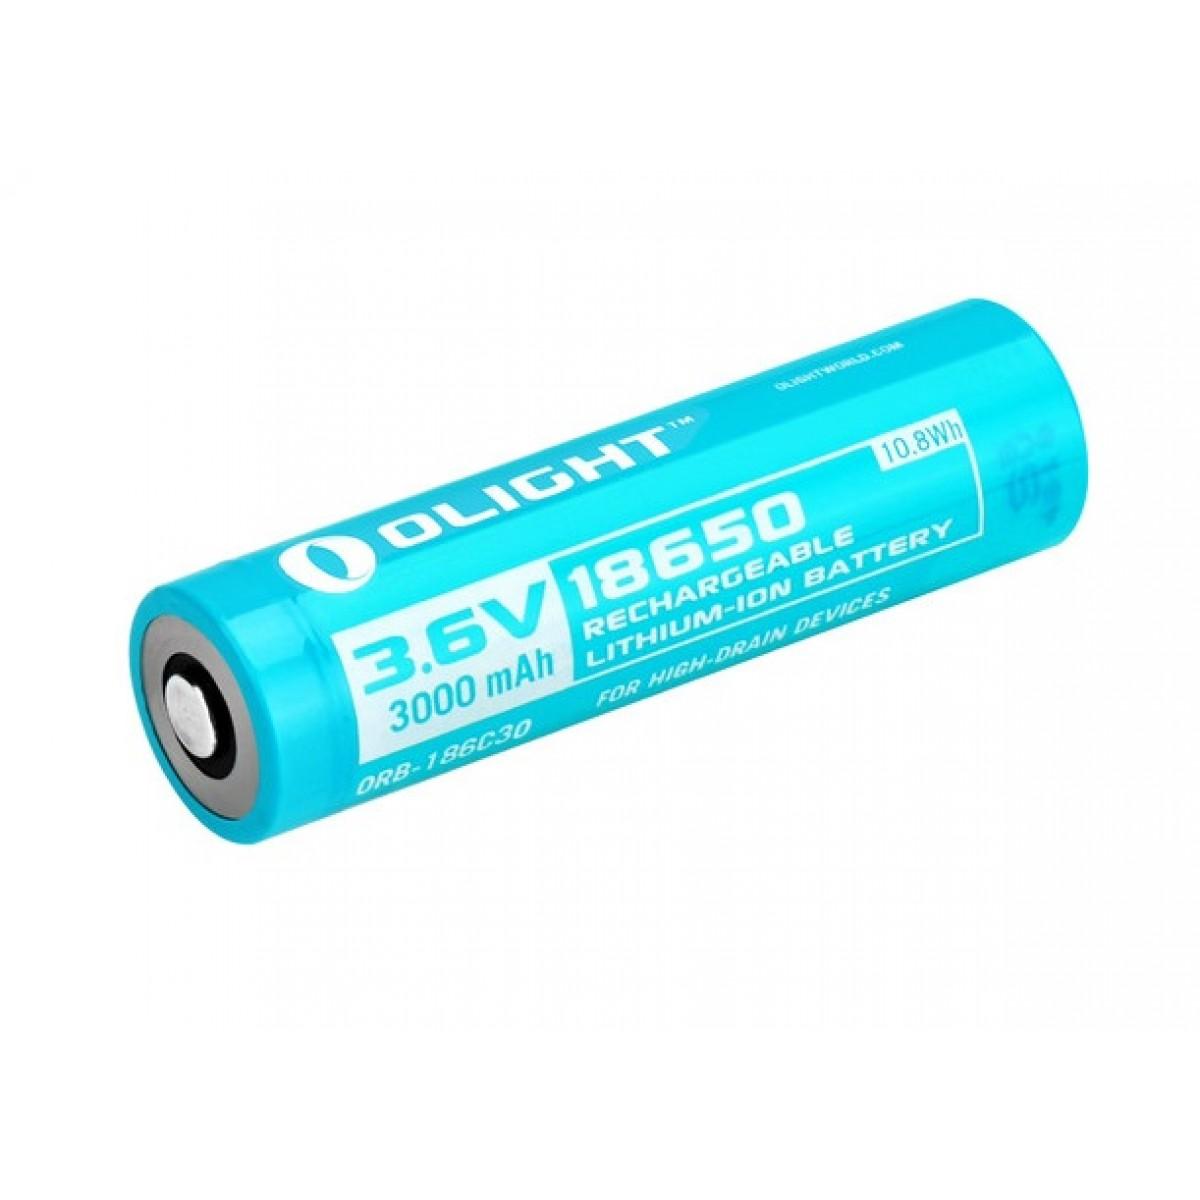 Olight Customized 18650 3000mAH Li-ion Battery for Olight H2R